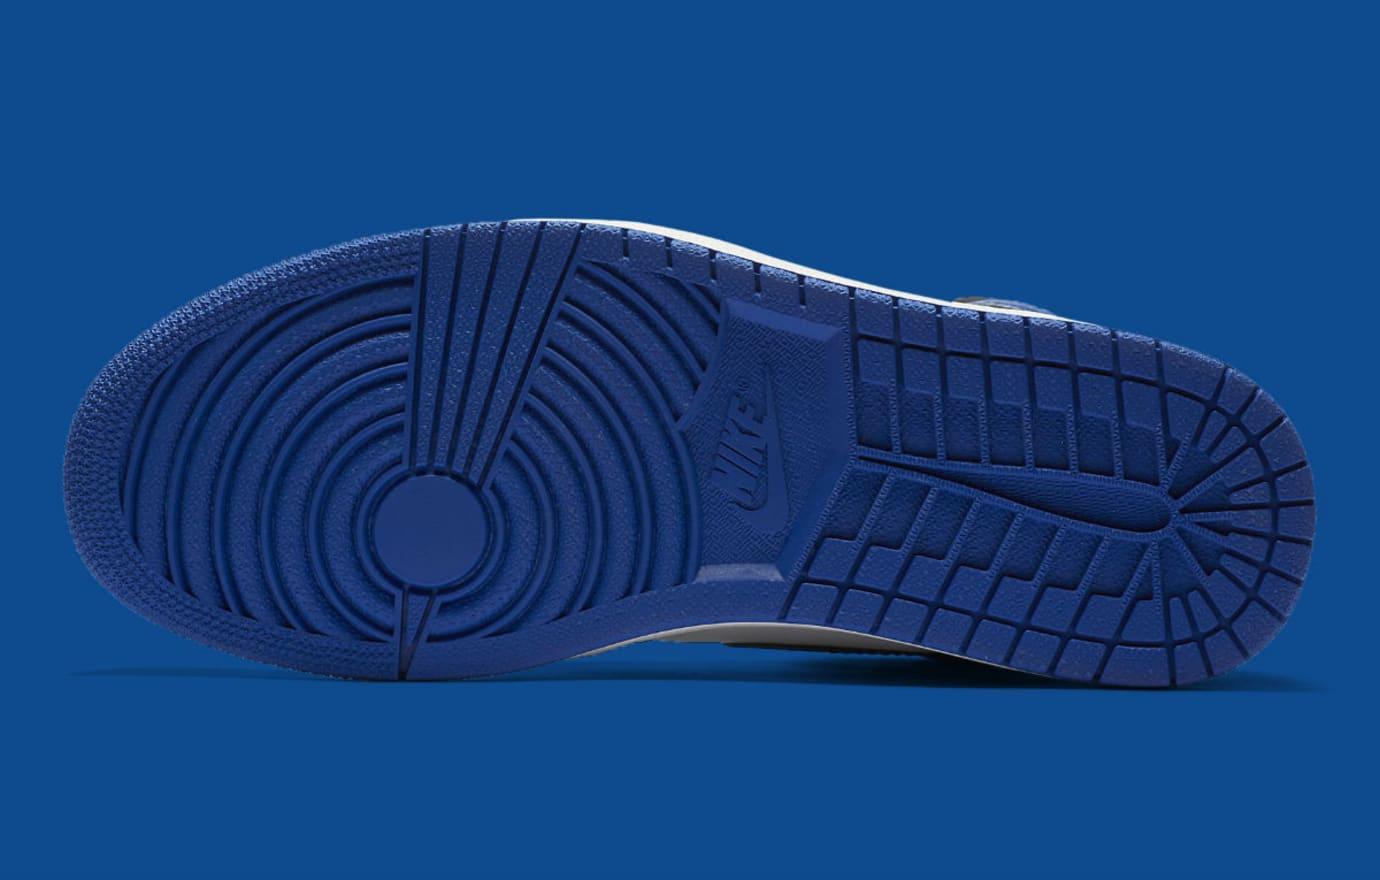 Air Jordan 1 High Game Royal Release Date 555088-403 Sole